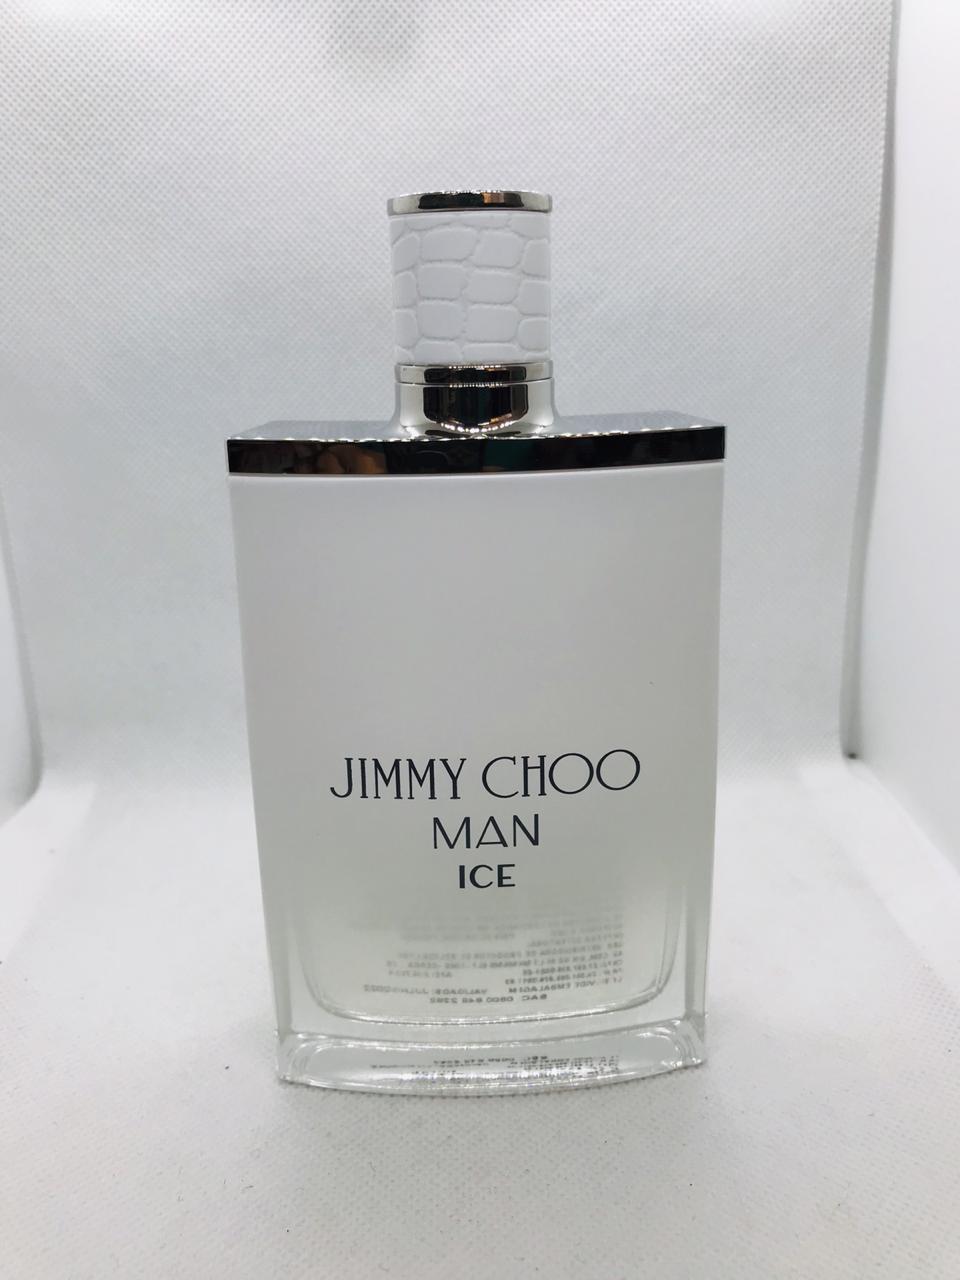 Jimmy Choo Man Ice Perfume Masculino Eau de Toilette 100ml - Tester